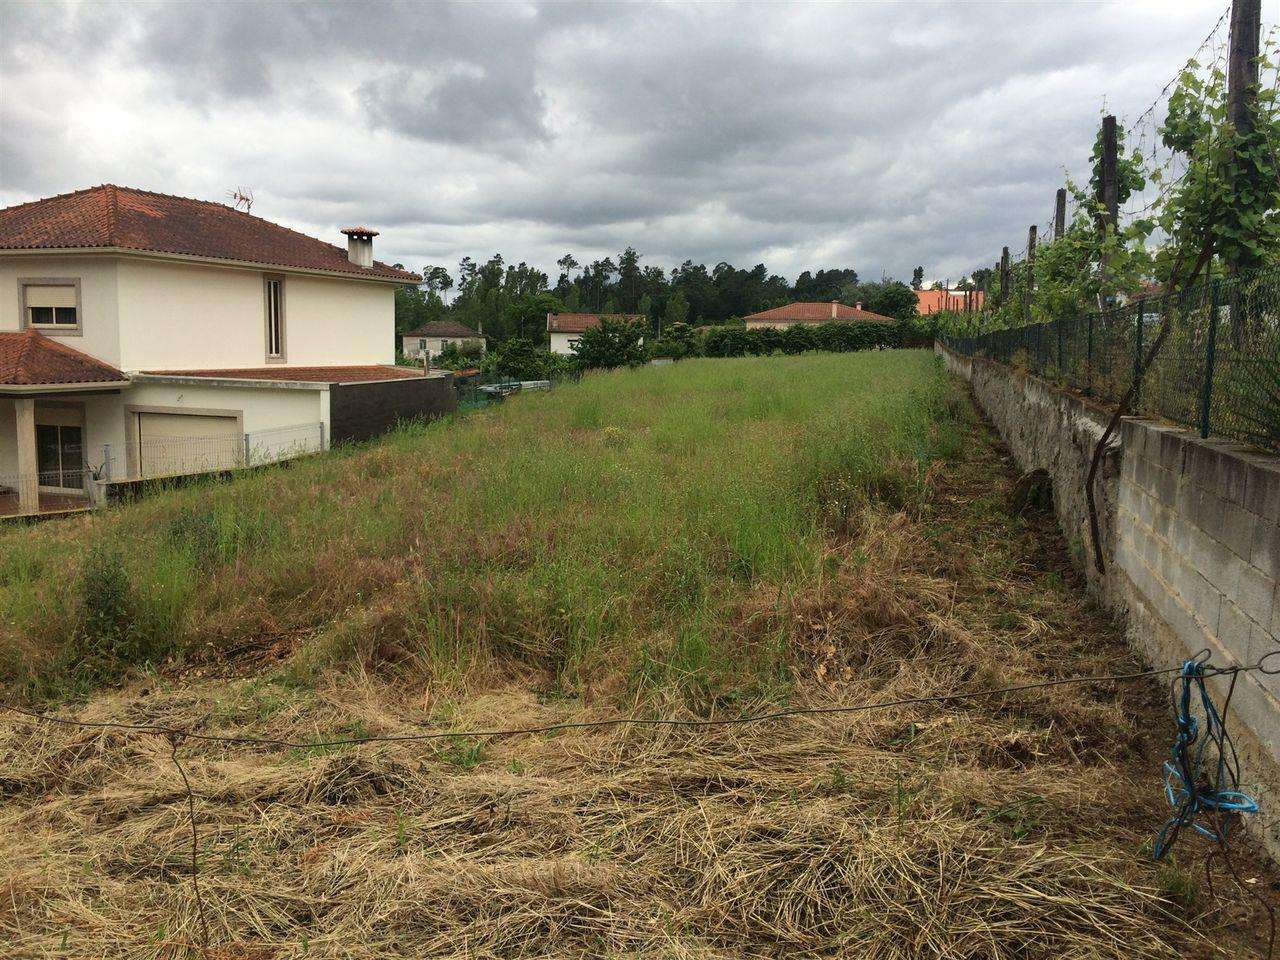 Terreno para comprar, Vila Verde e Barbudo, Braga - Foto 2